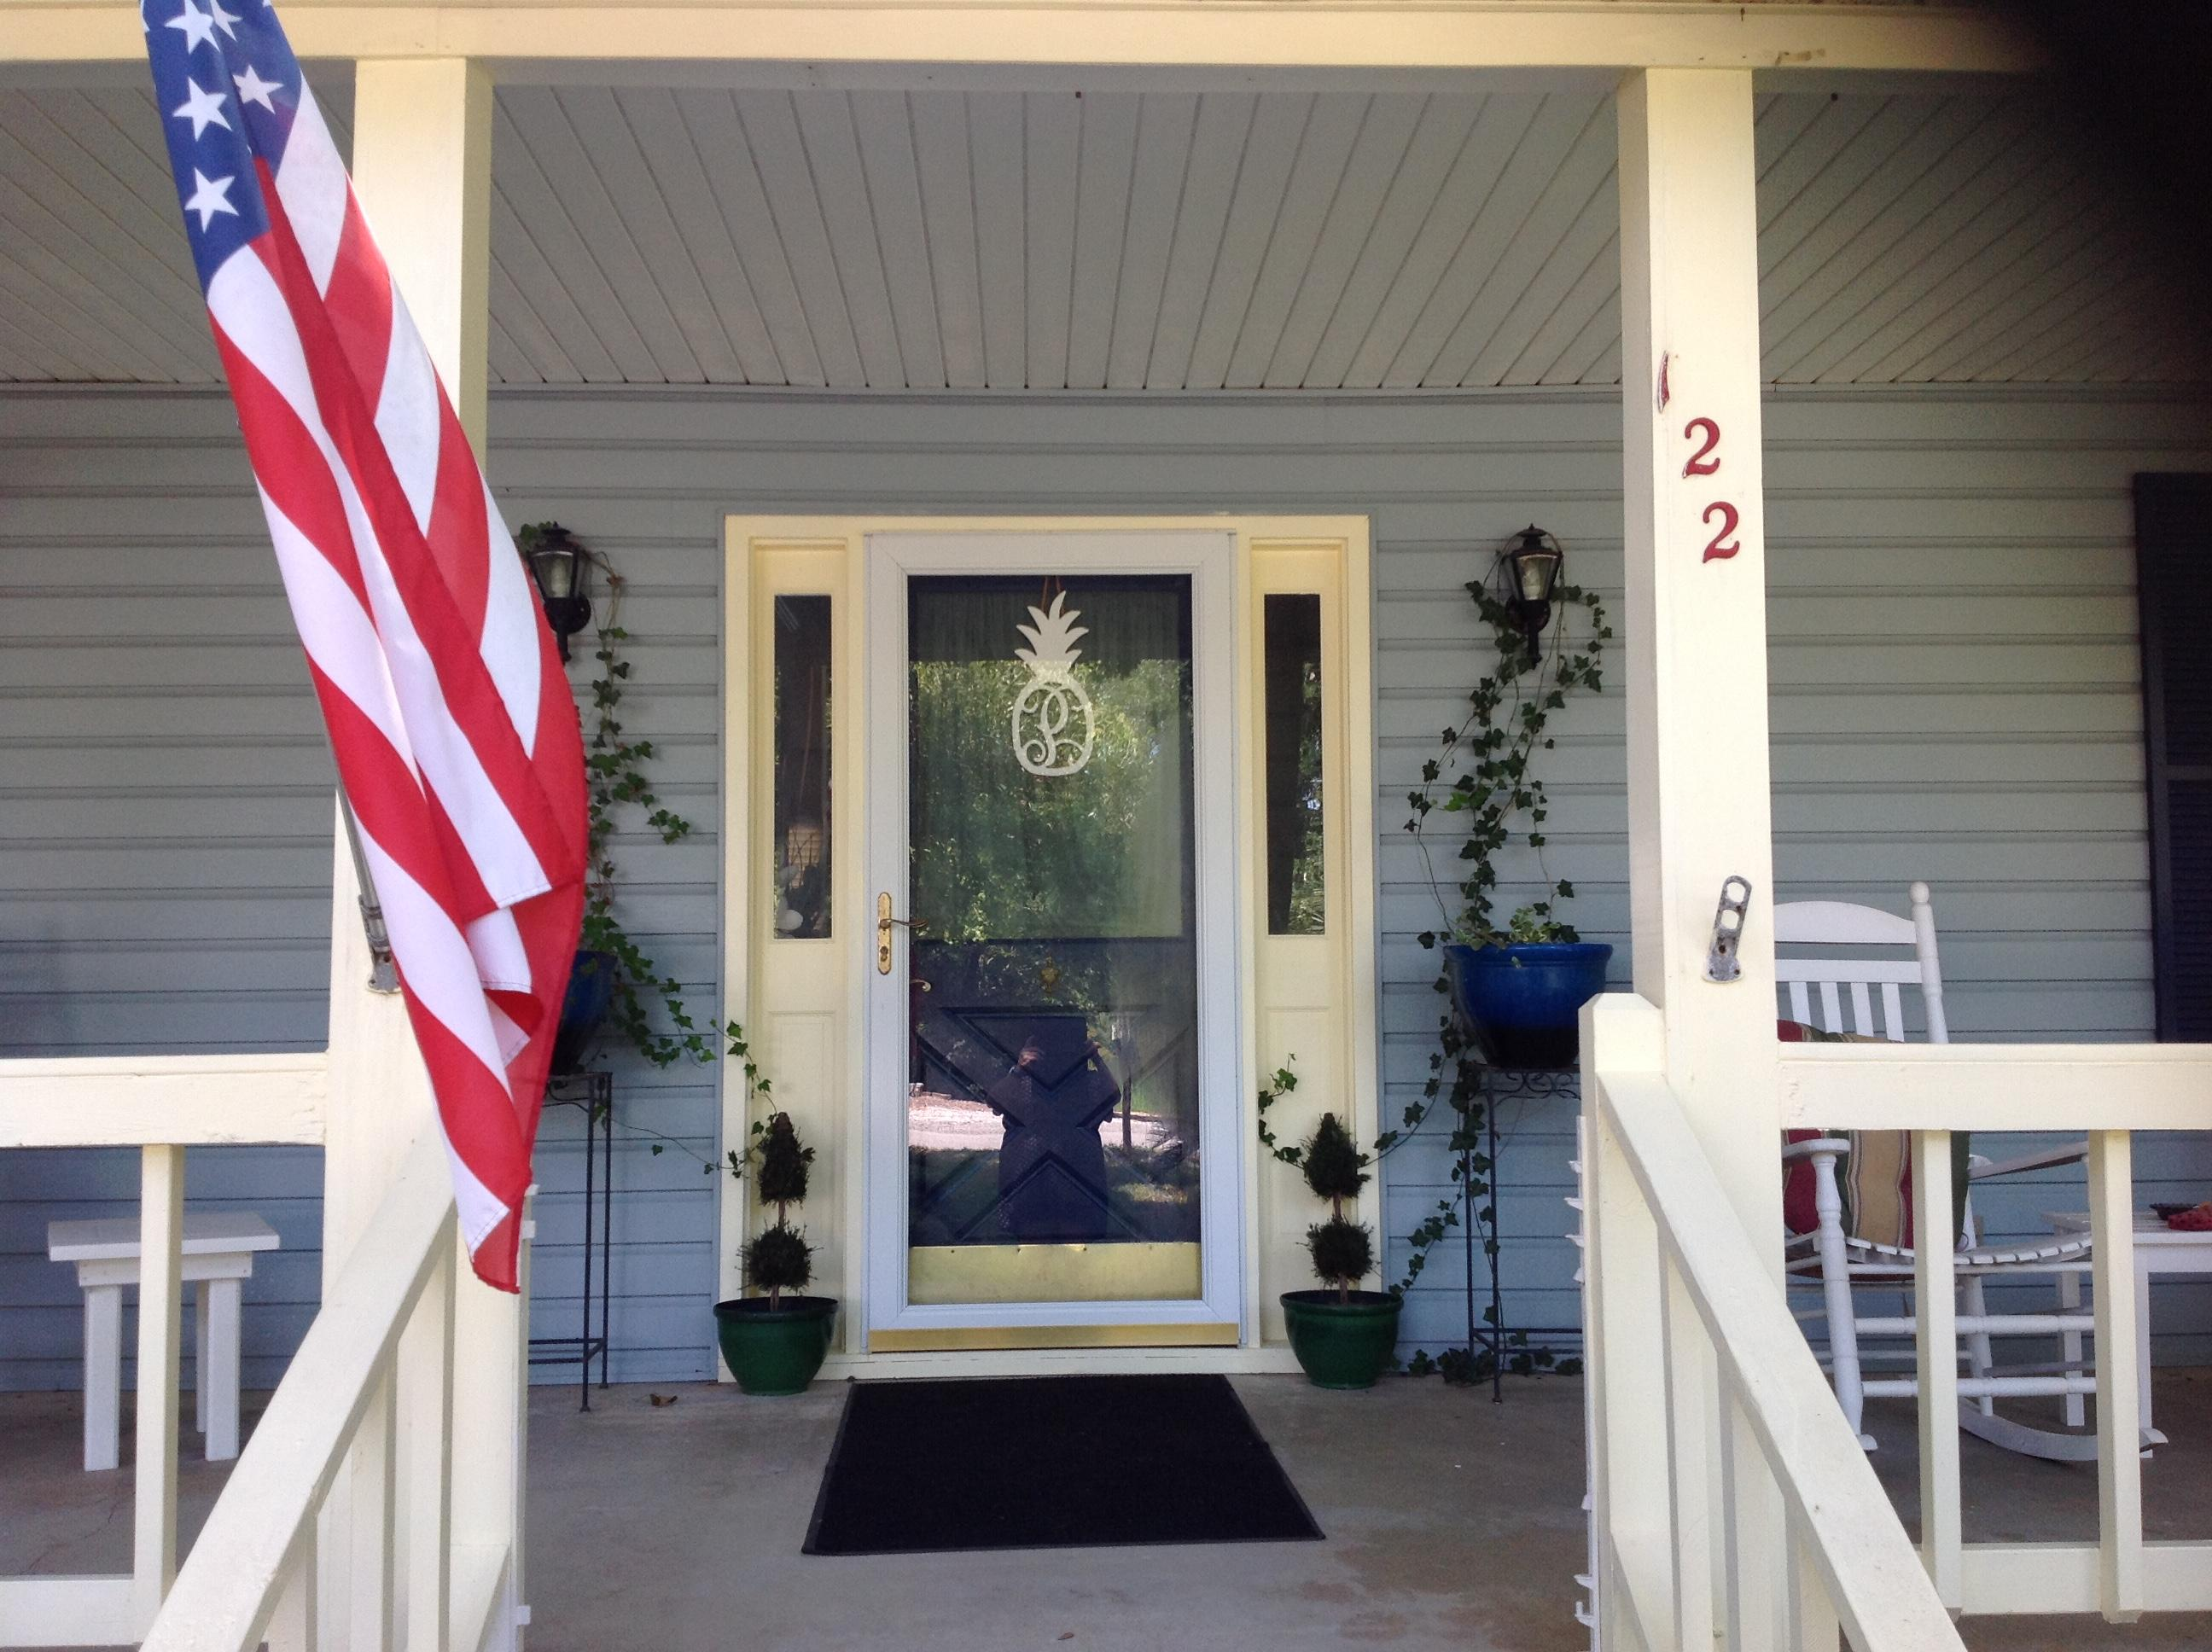 Belvedere II Homes For Sale - 122 Dogwood, Eutawville, SC - 3